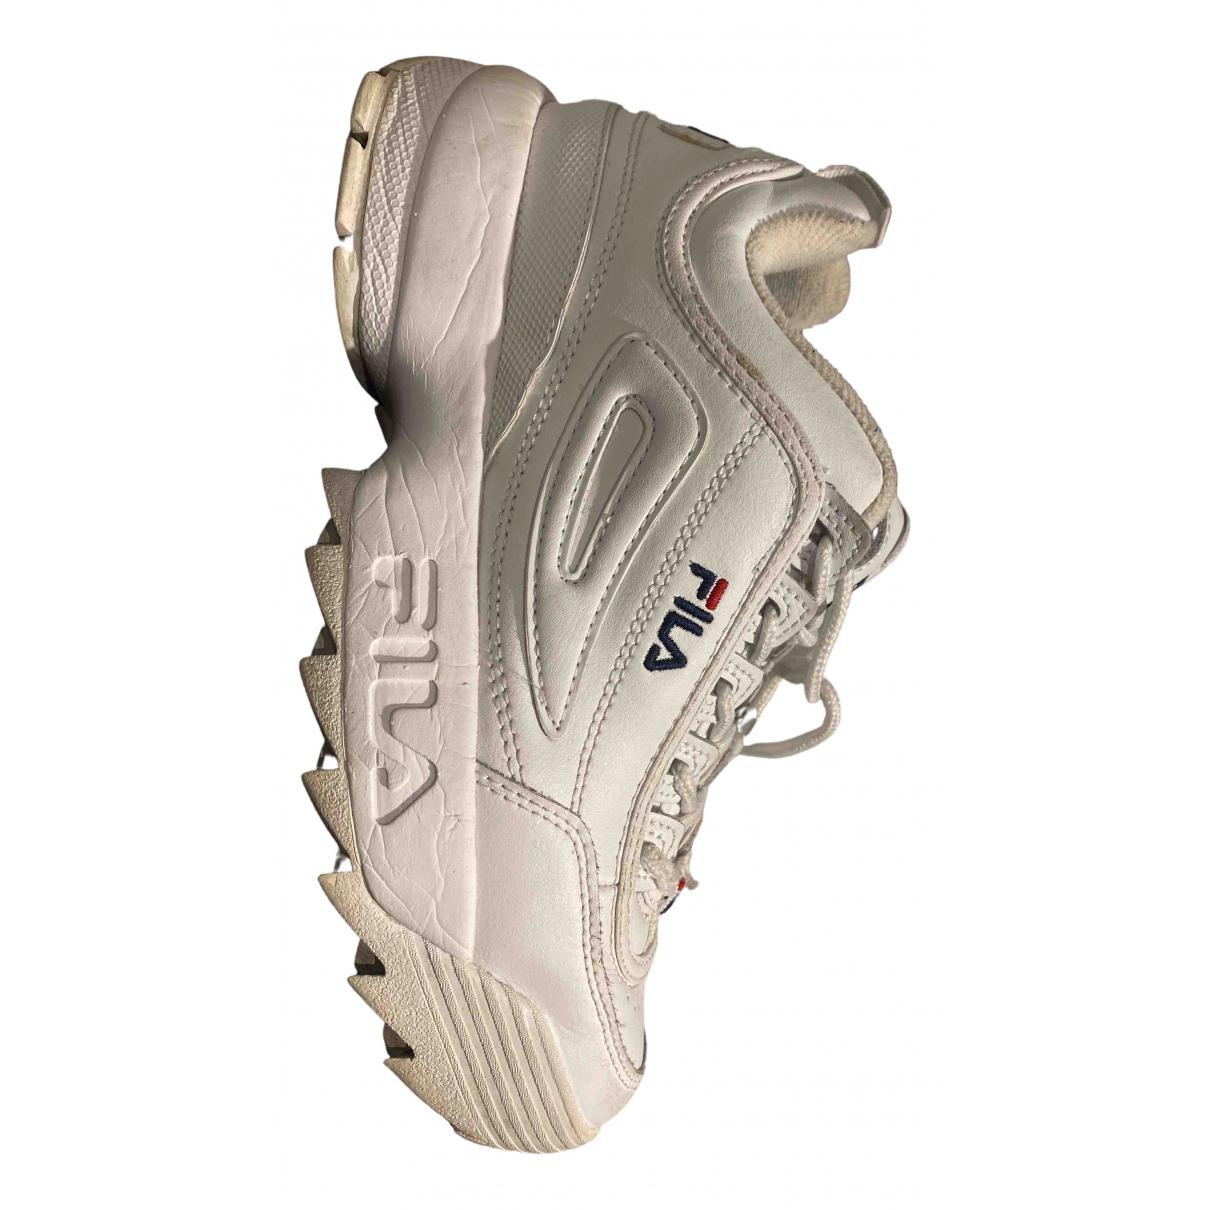 Fila N White Exotic leathers Trainers for Women 38.5 EU